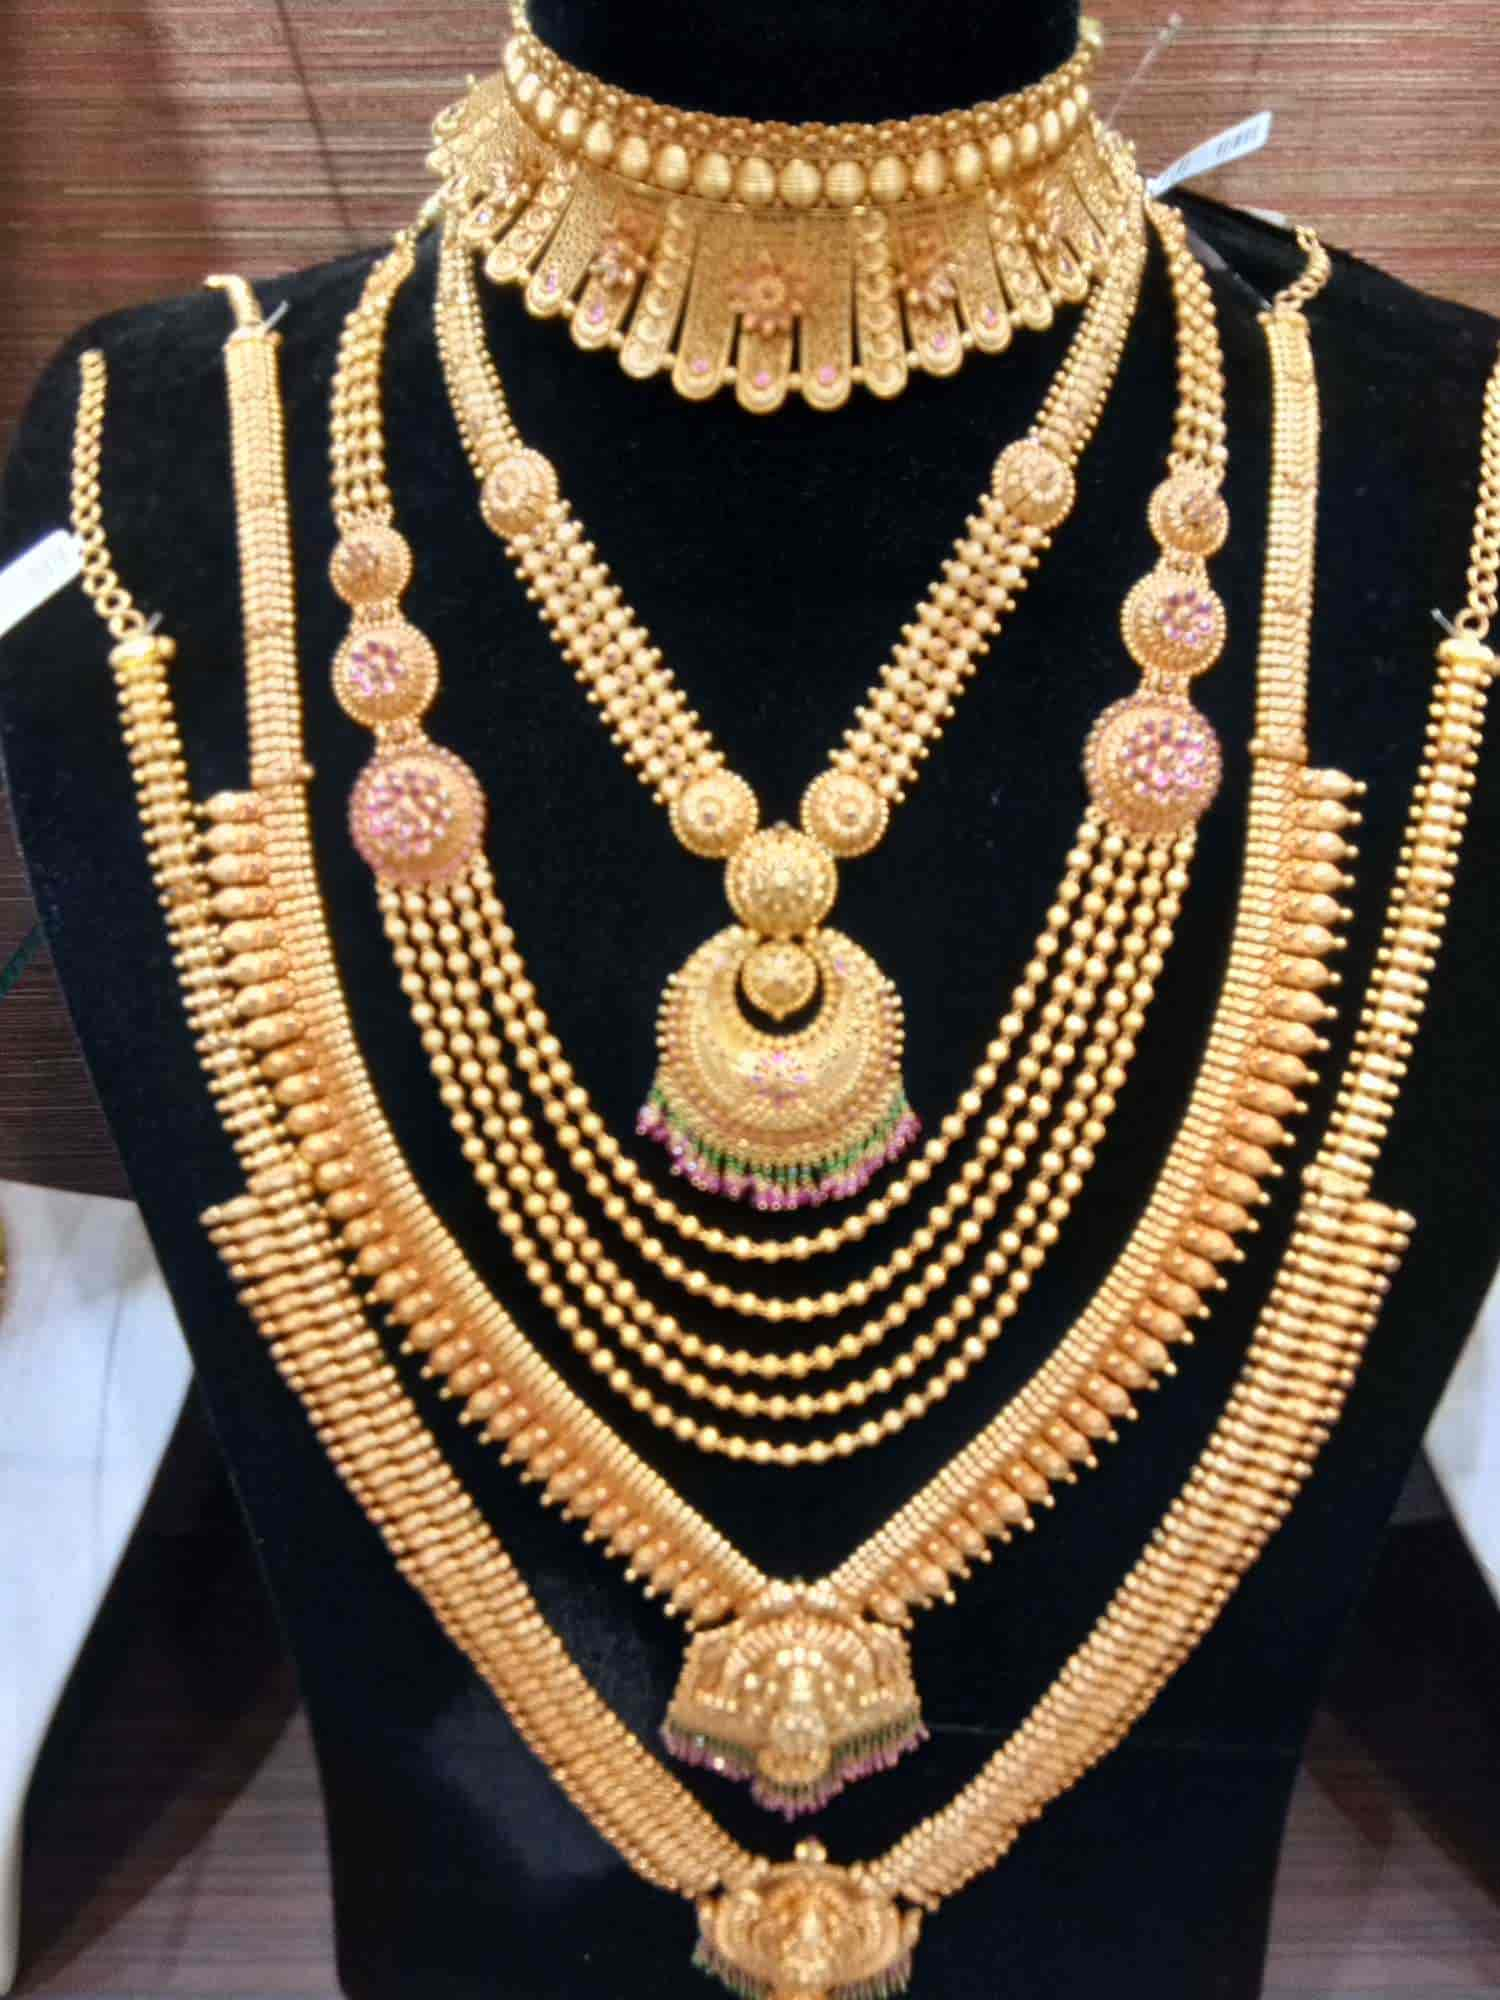 Malabar Gold & Diamonds, Prakasam Road - Jewellery Showrooms